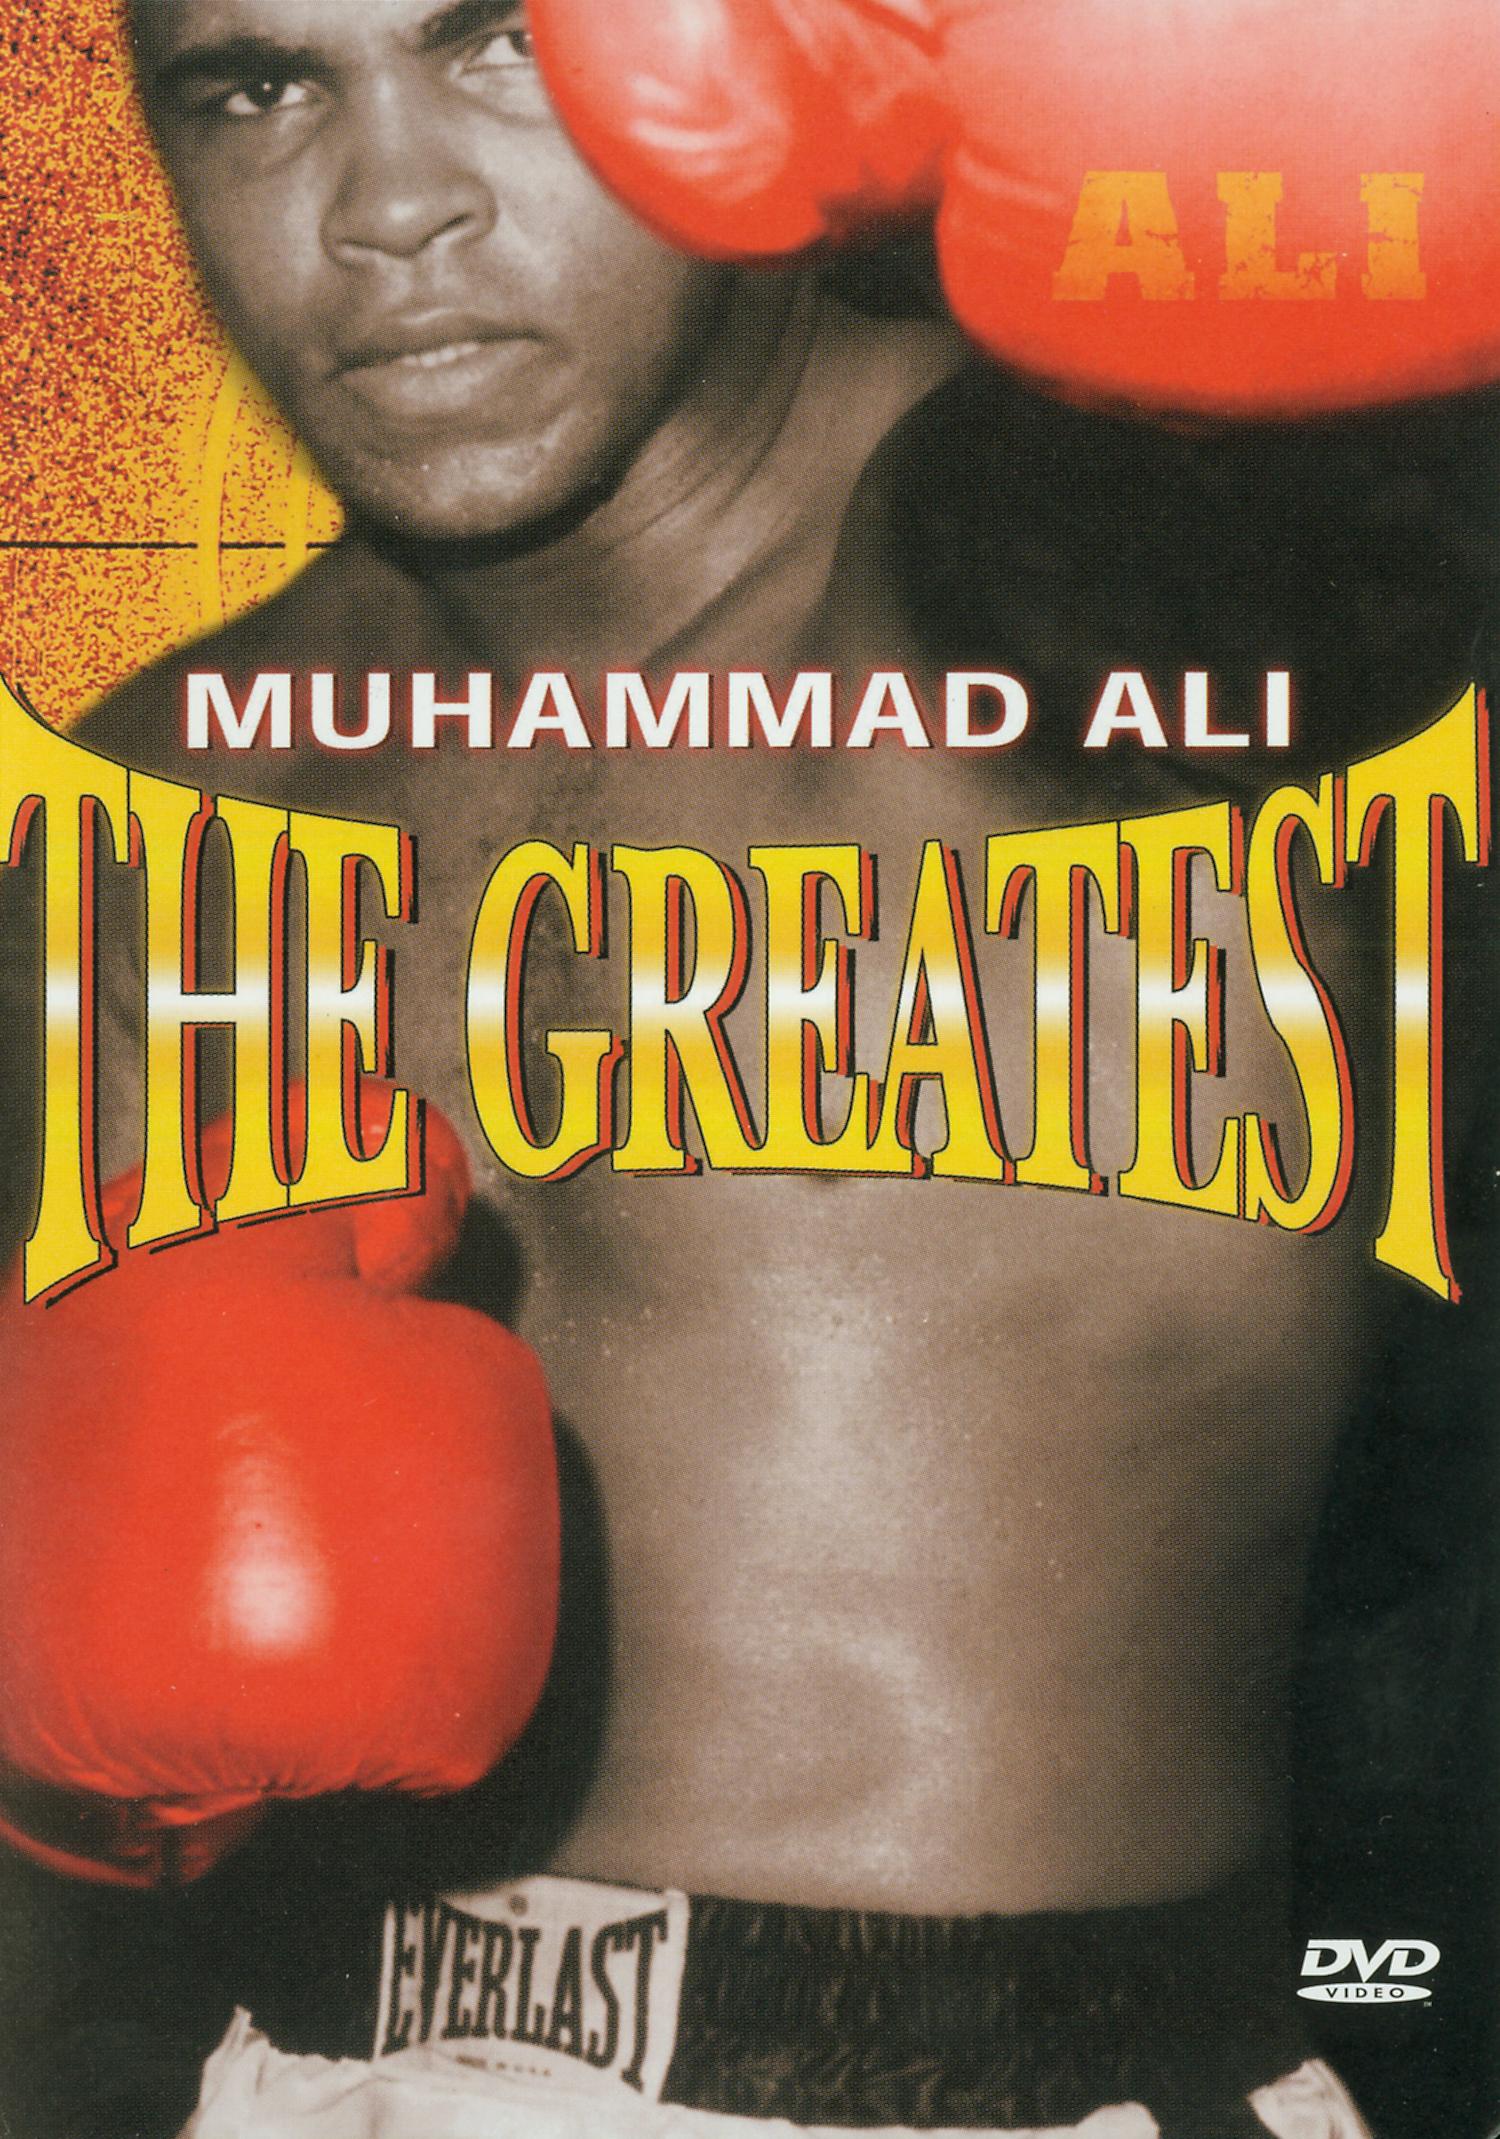 Muhammad Ali - The Greatest (NTSC) Poster